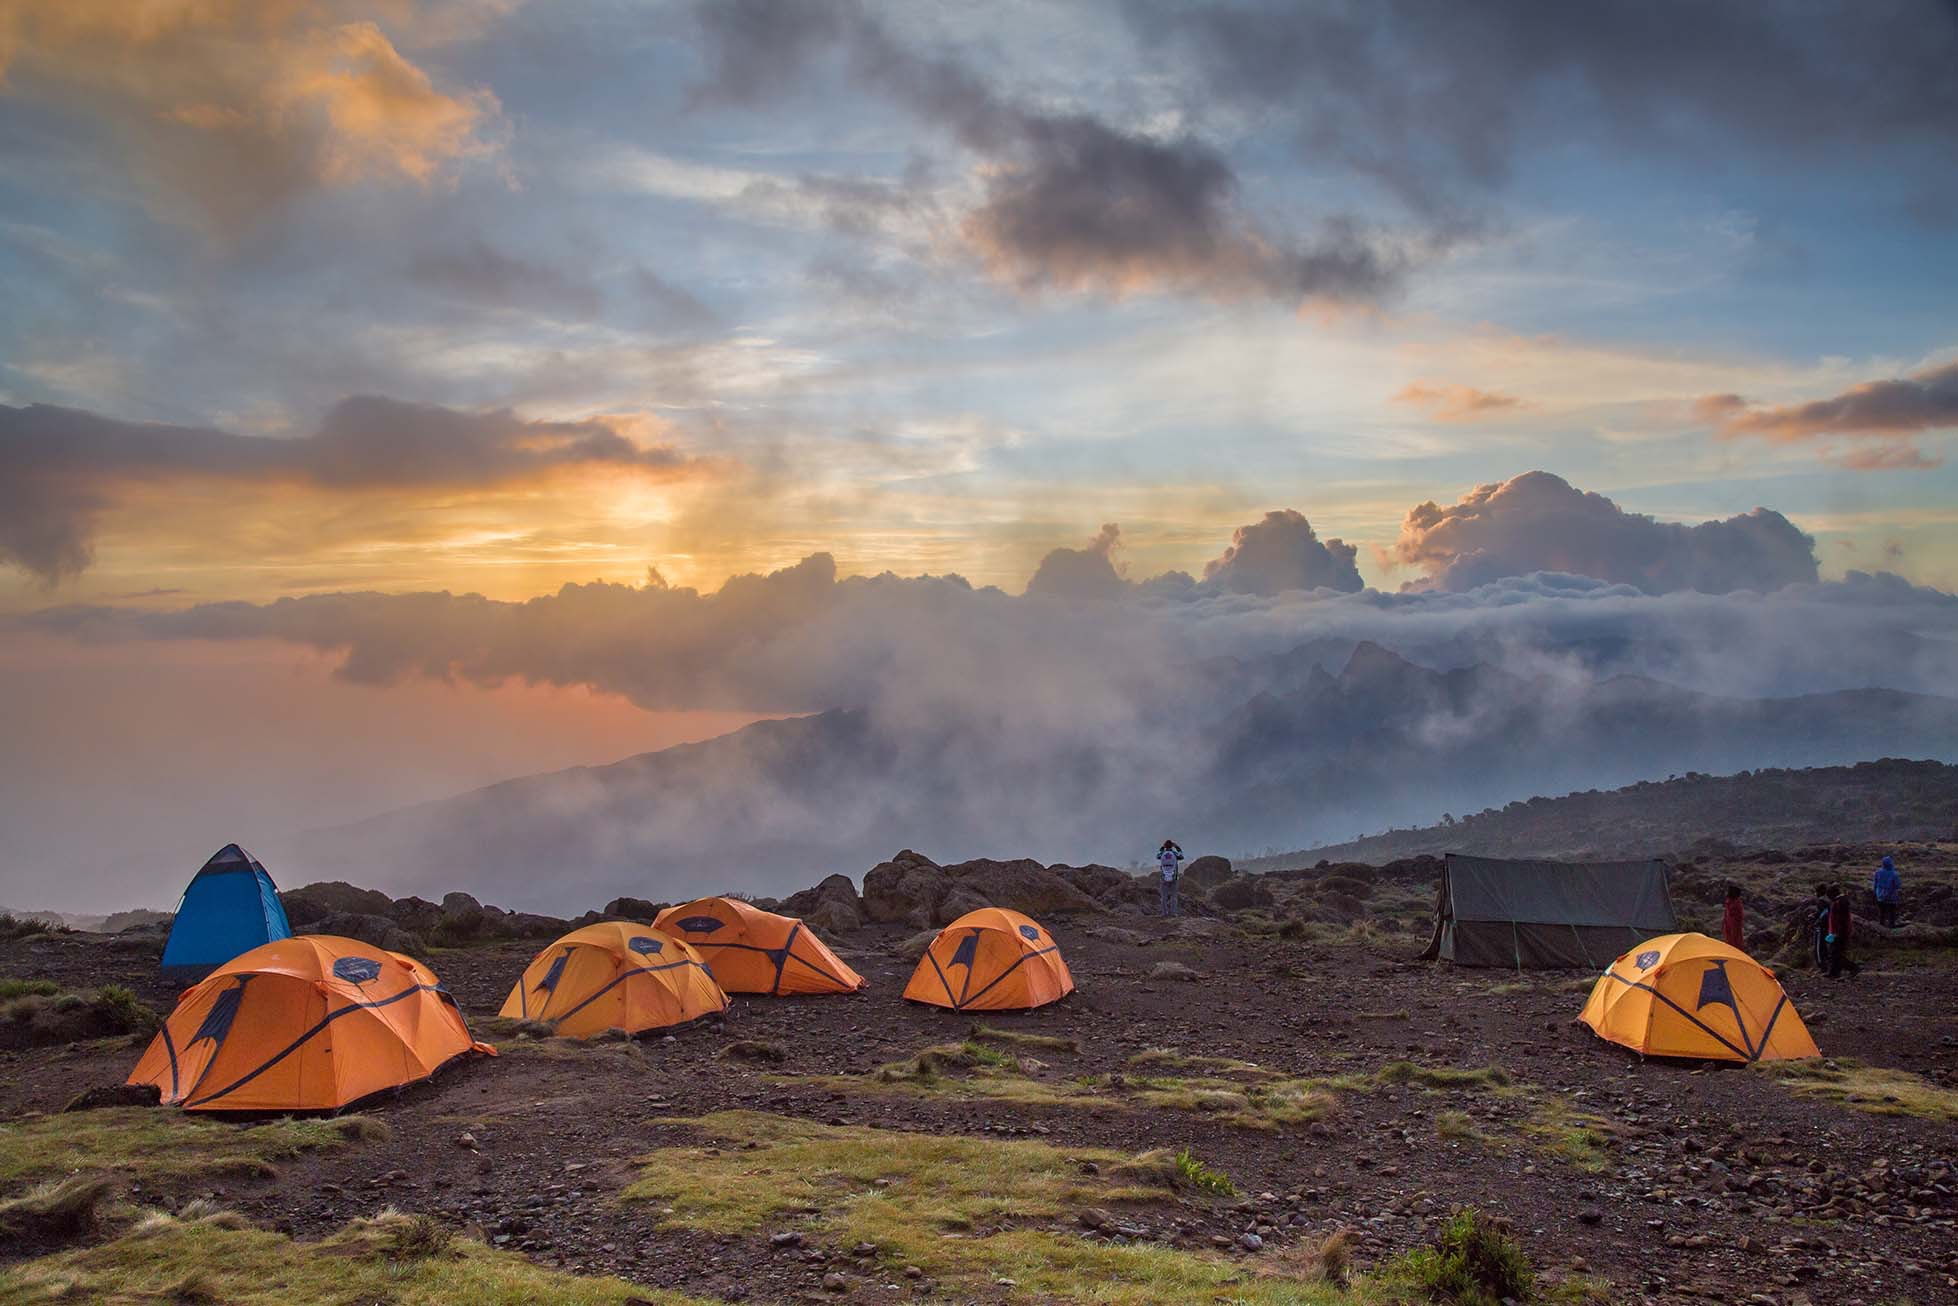 Kilimanjaro campsite